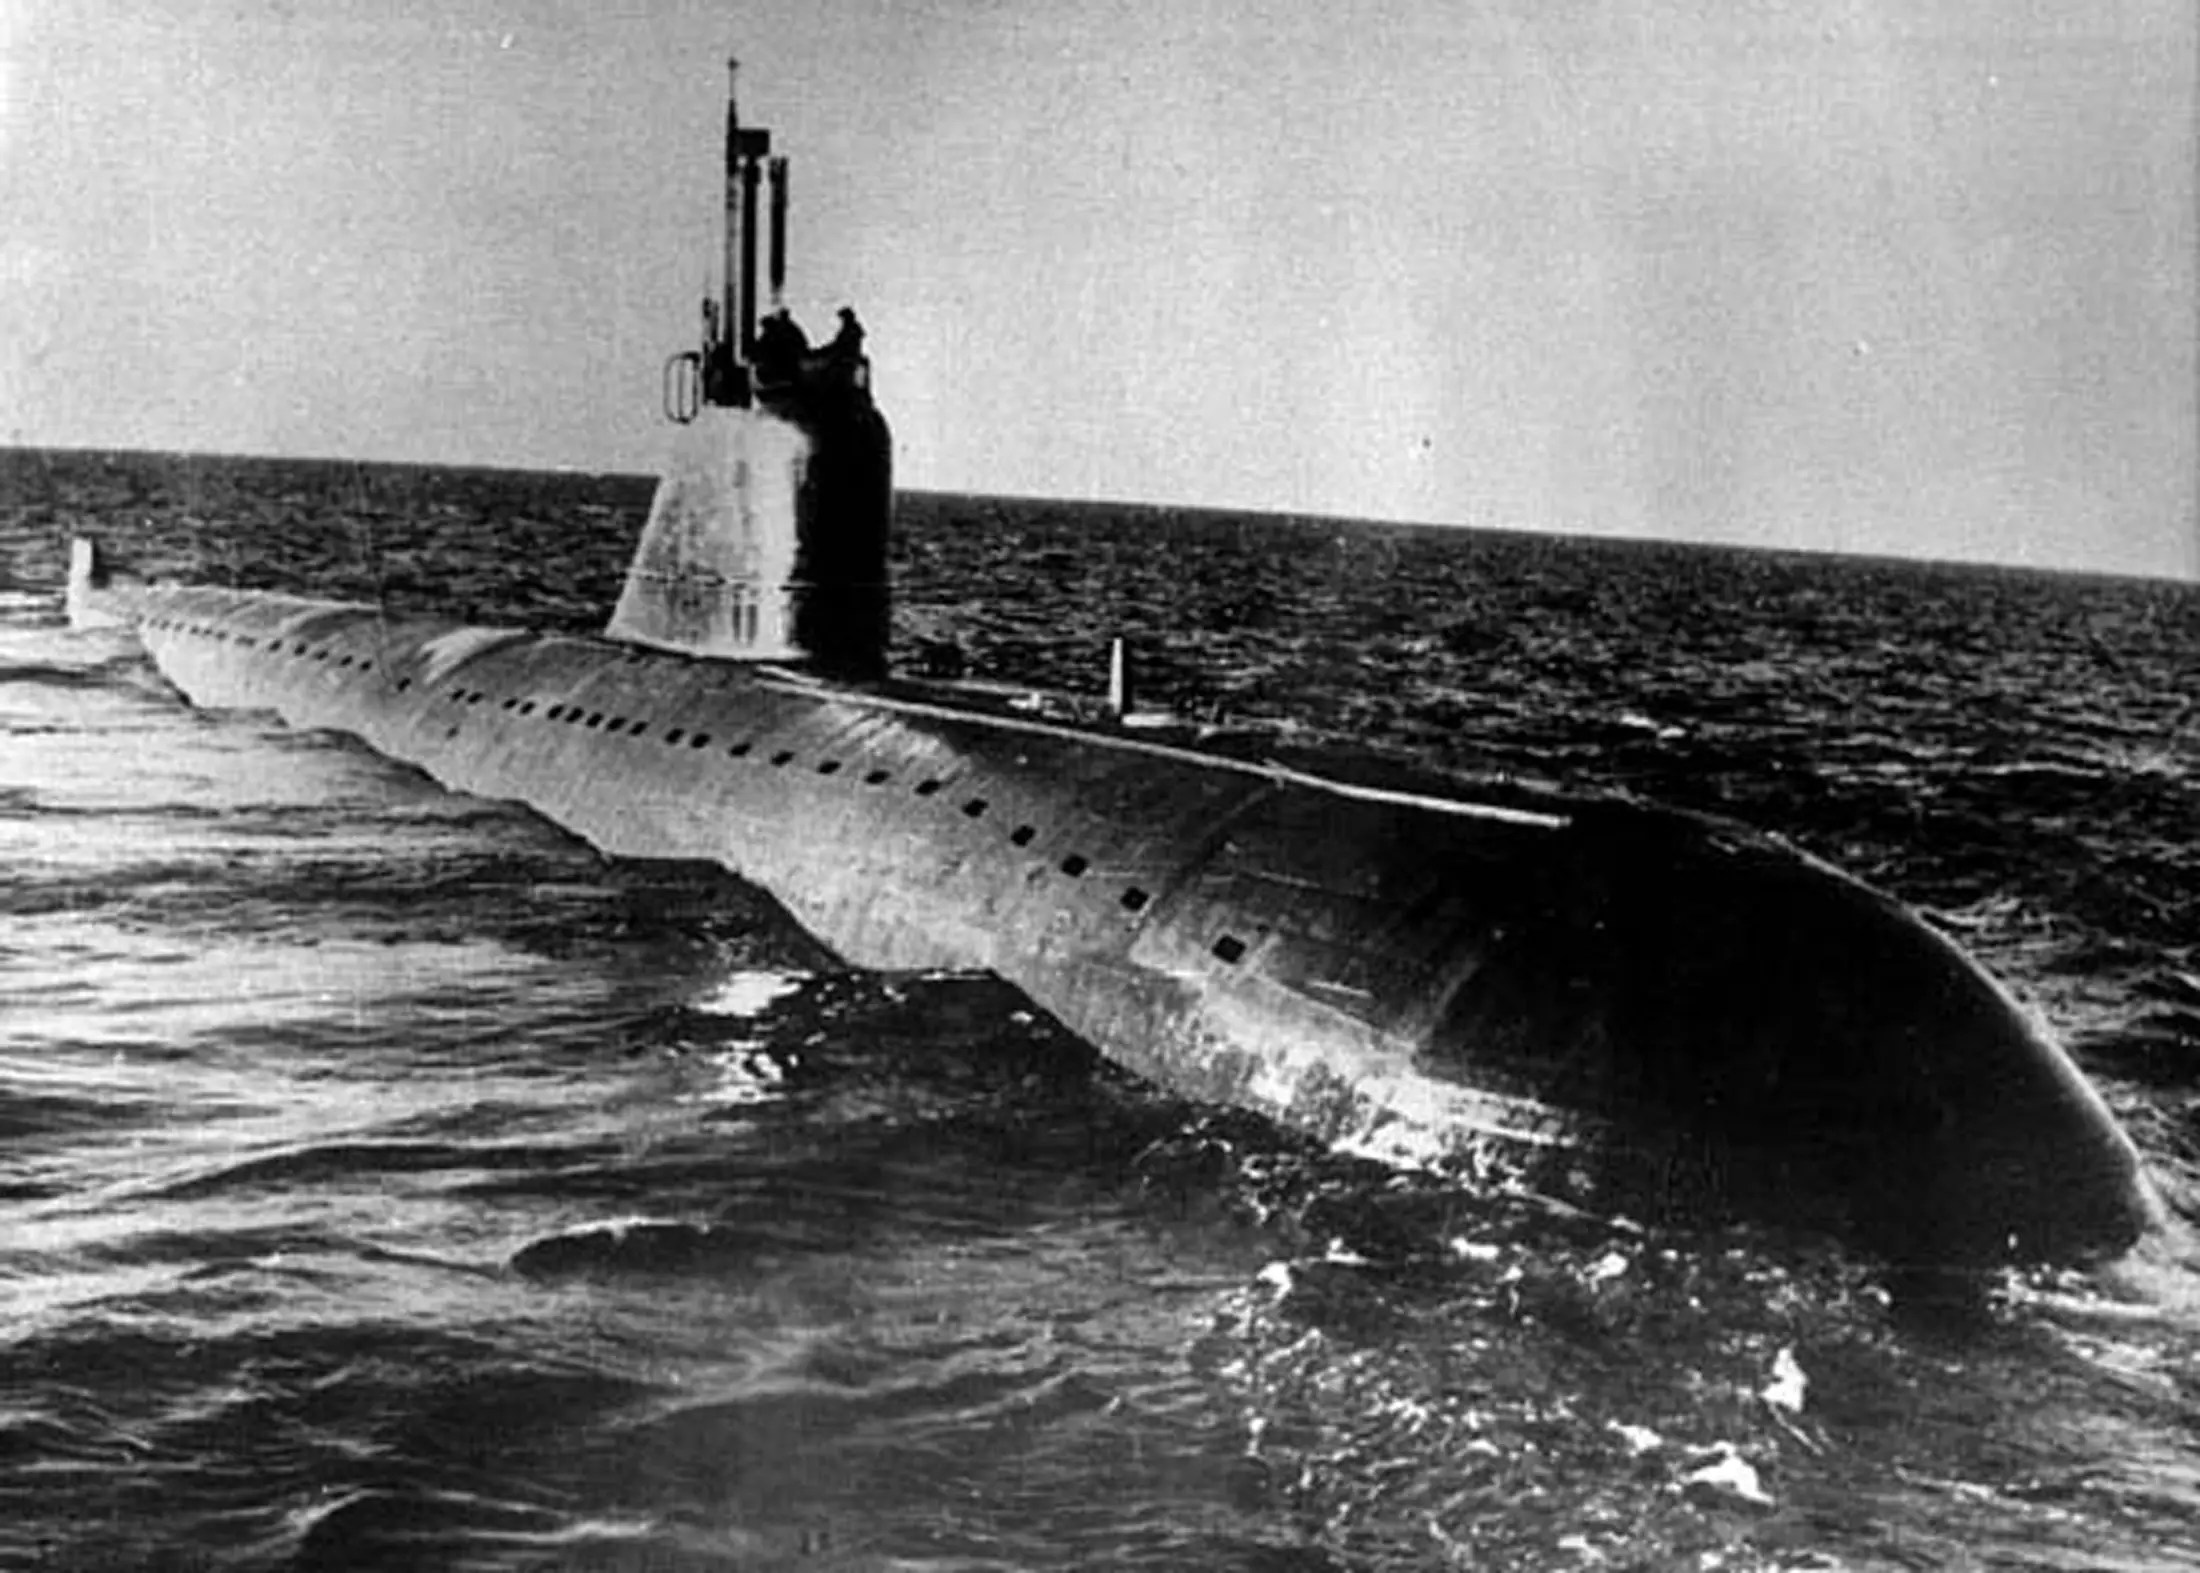 Soviet Submarine K-159